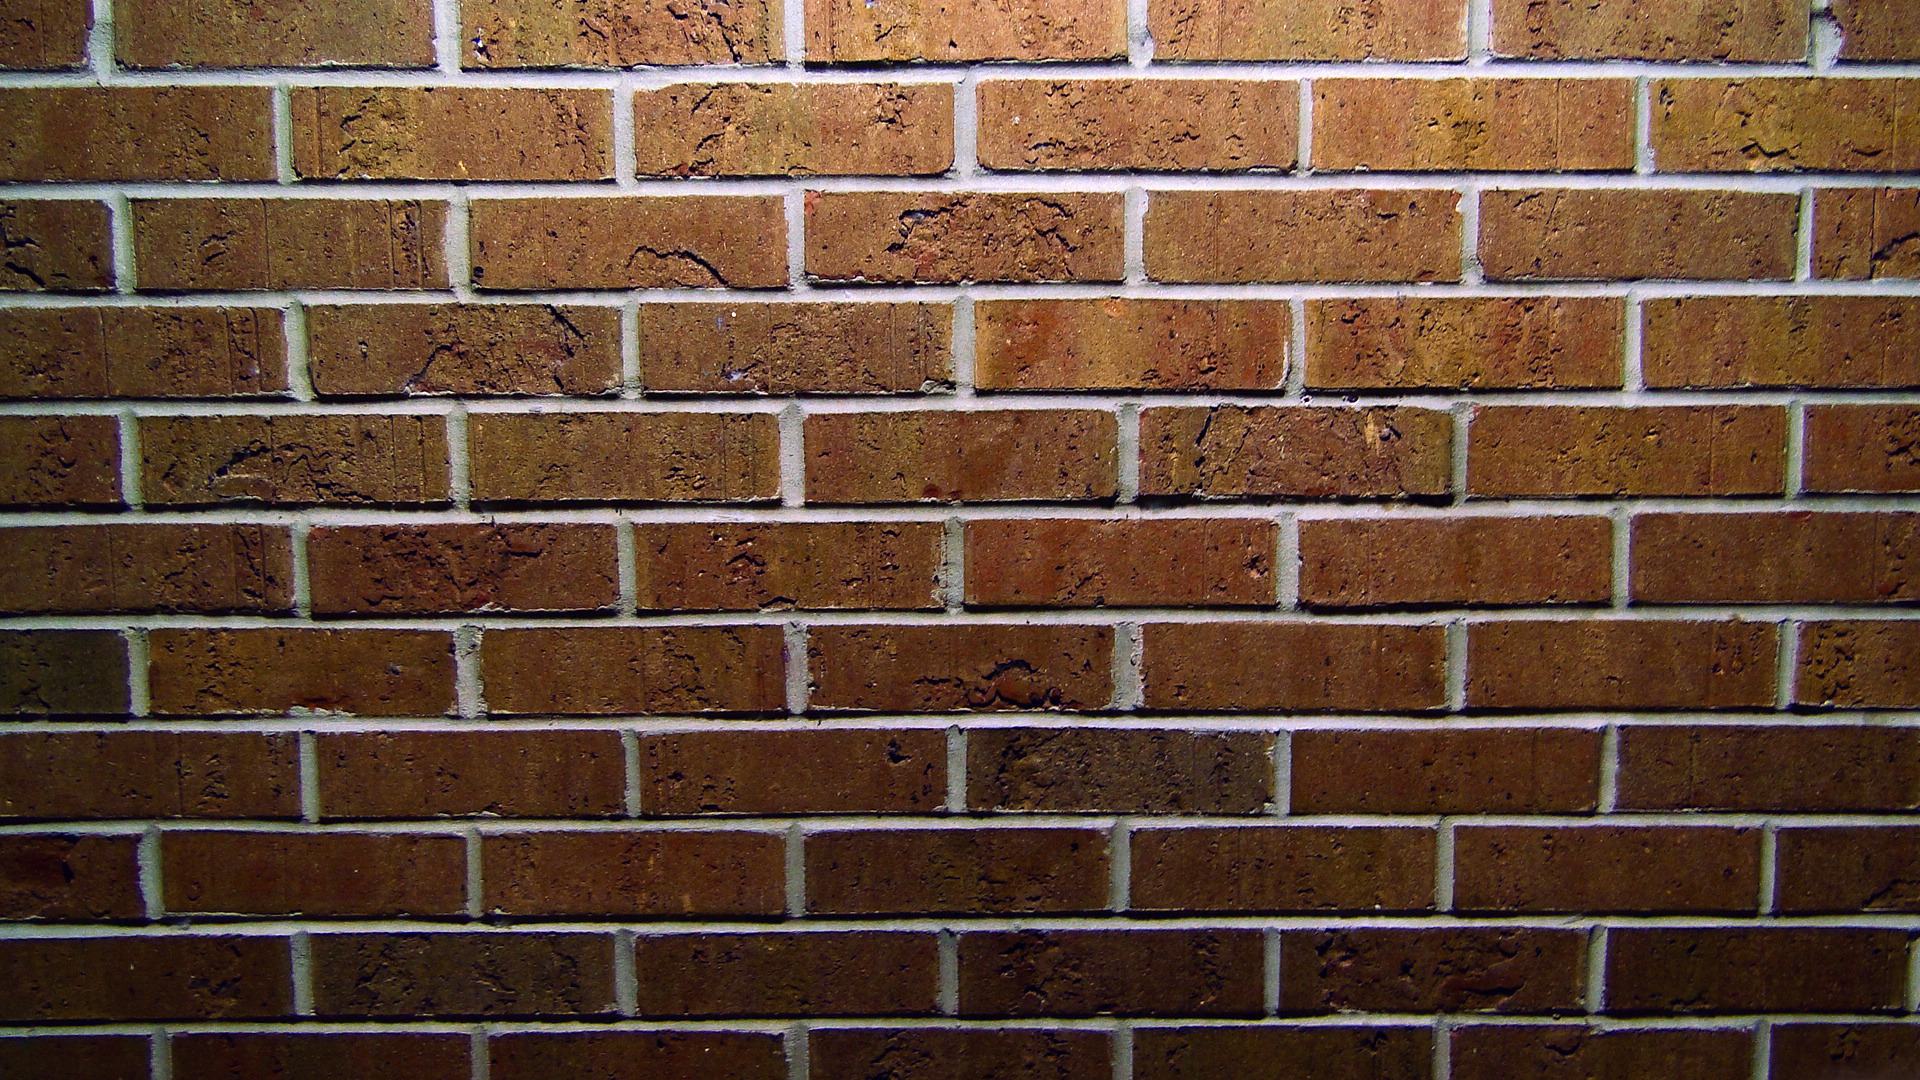 brick wall, bricks, background, texture, download photo